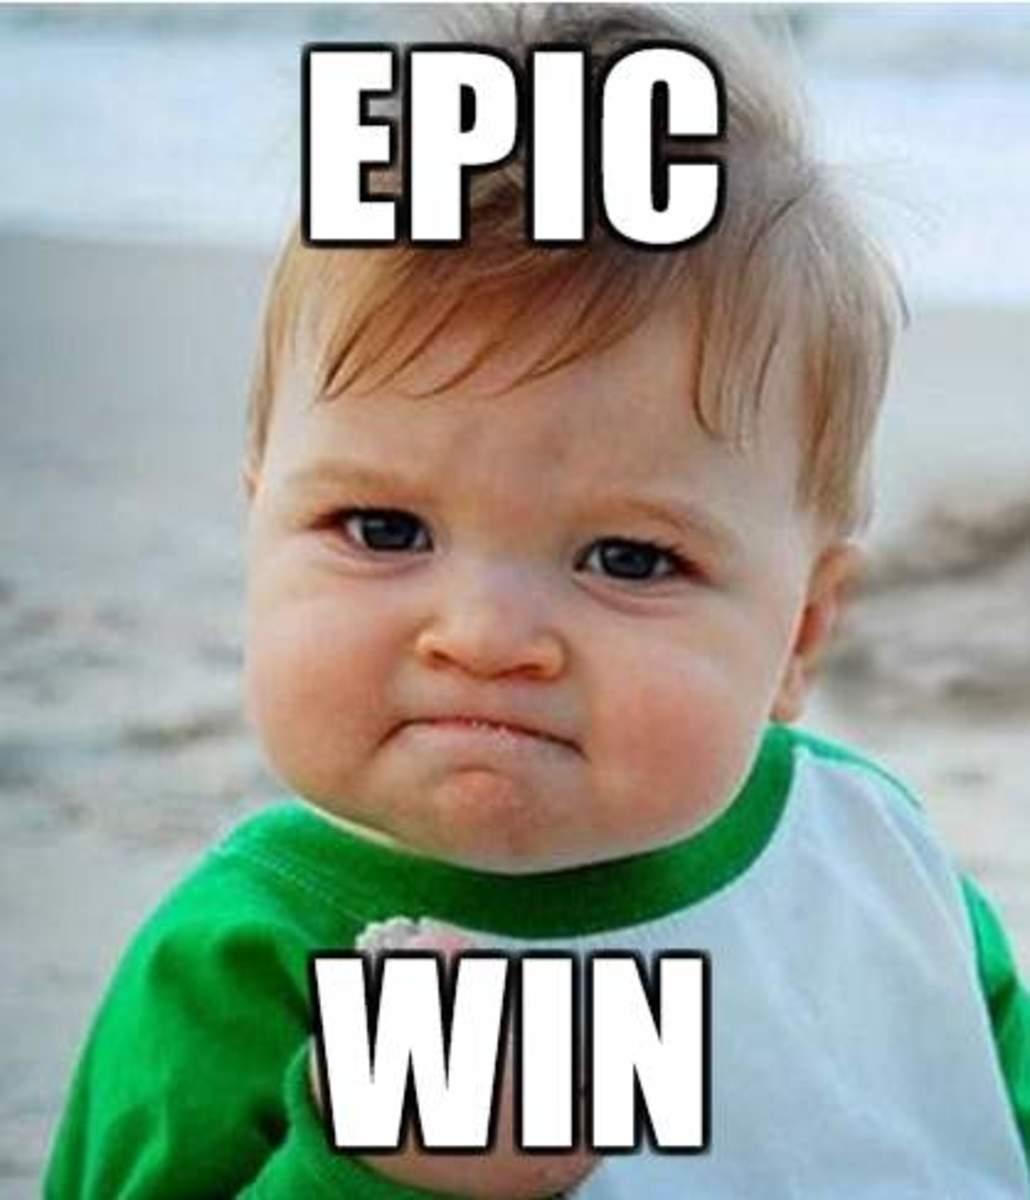 Epic win!